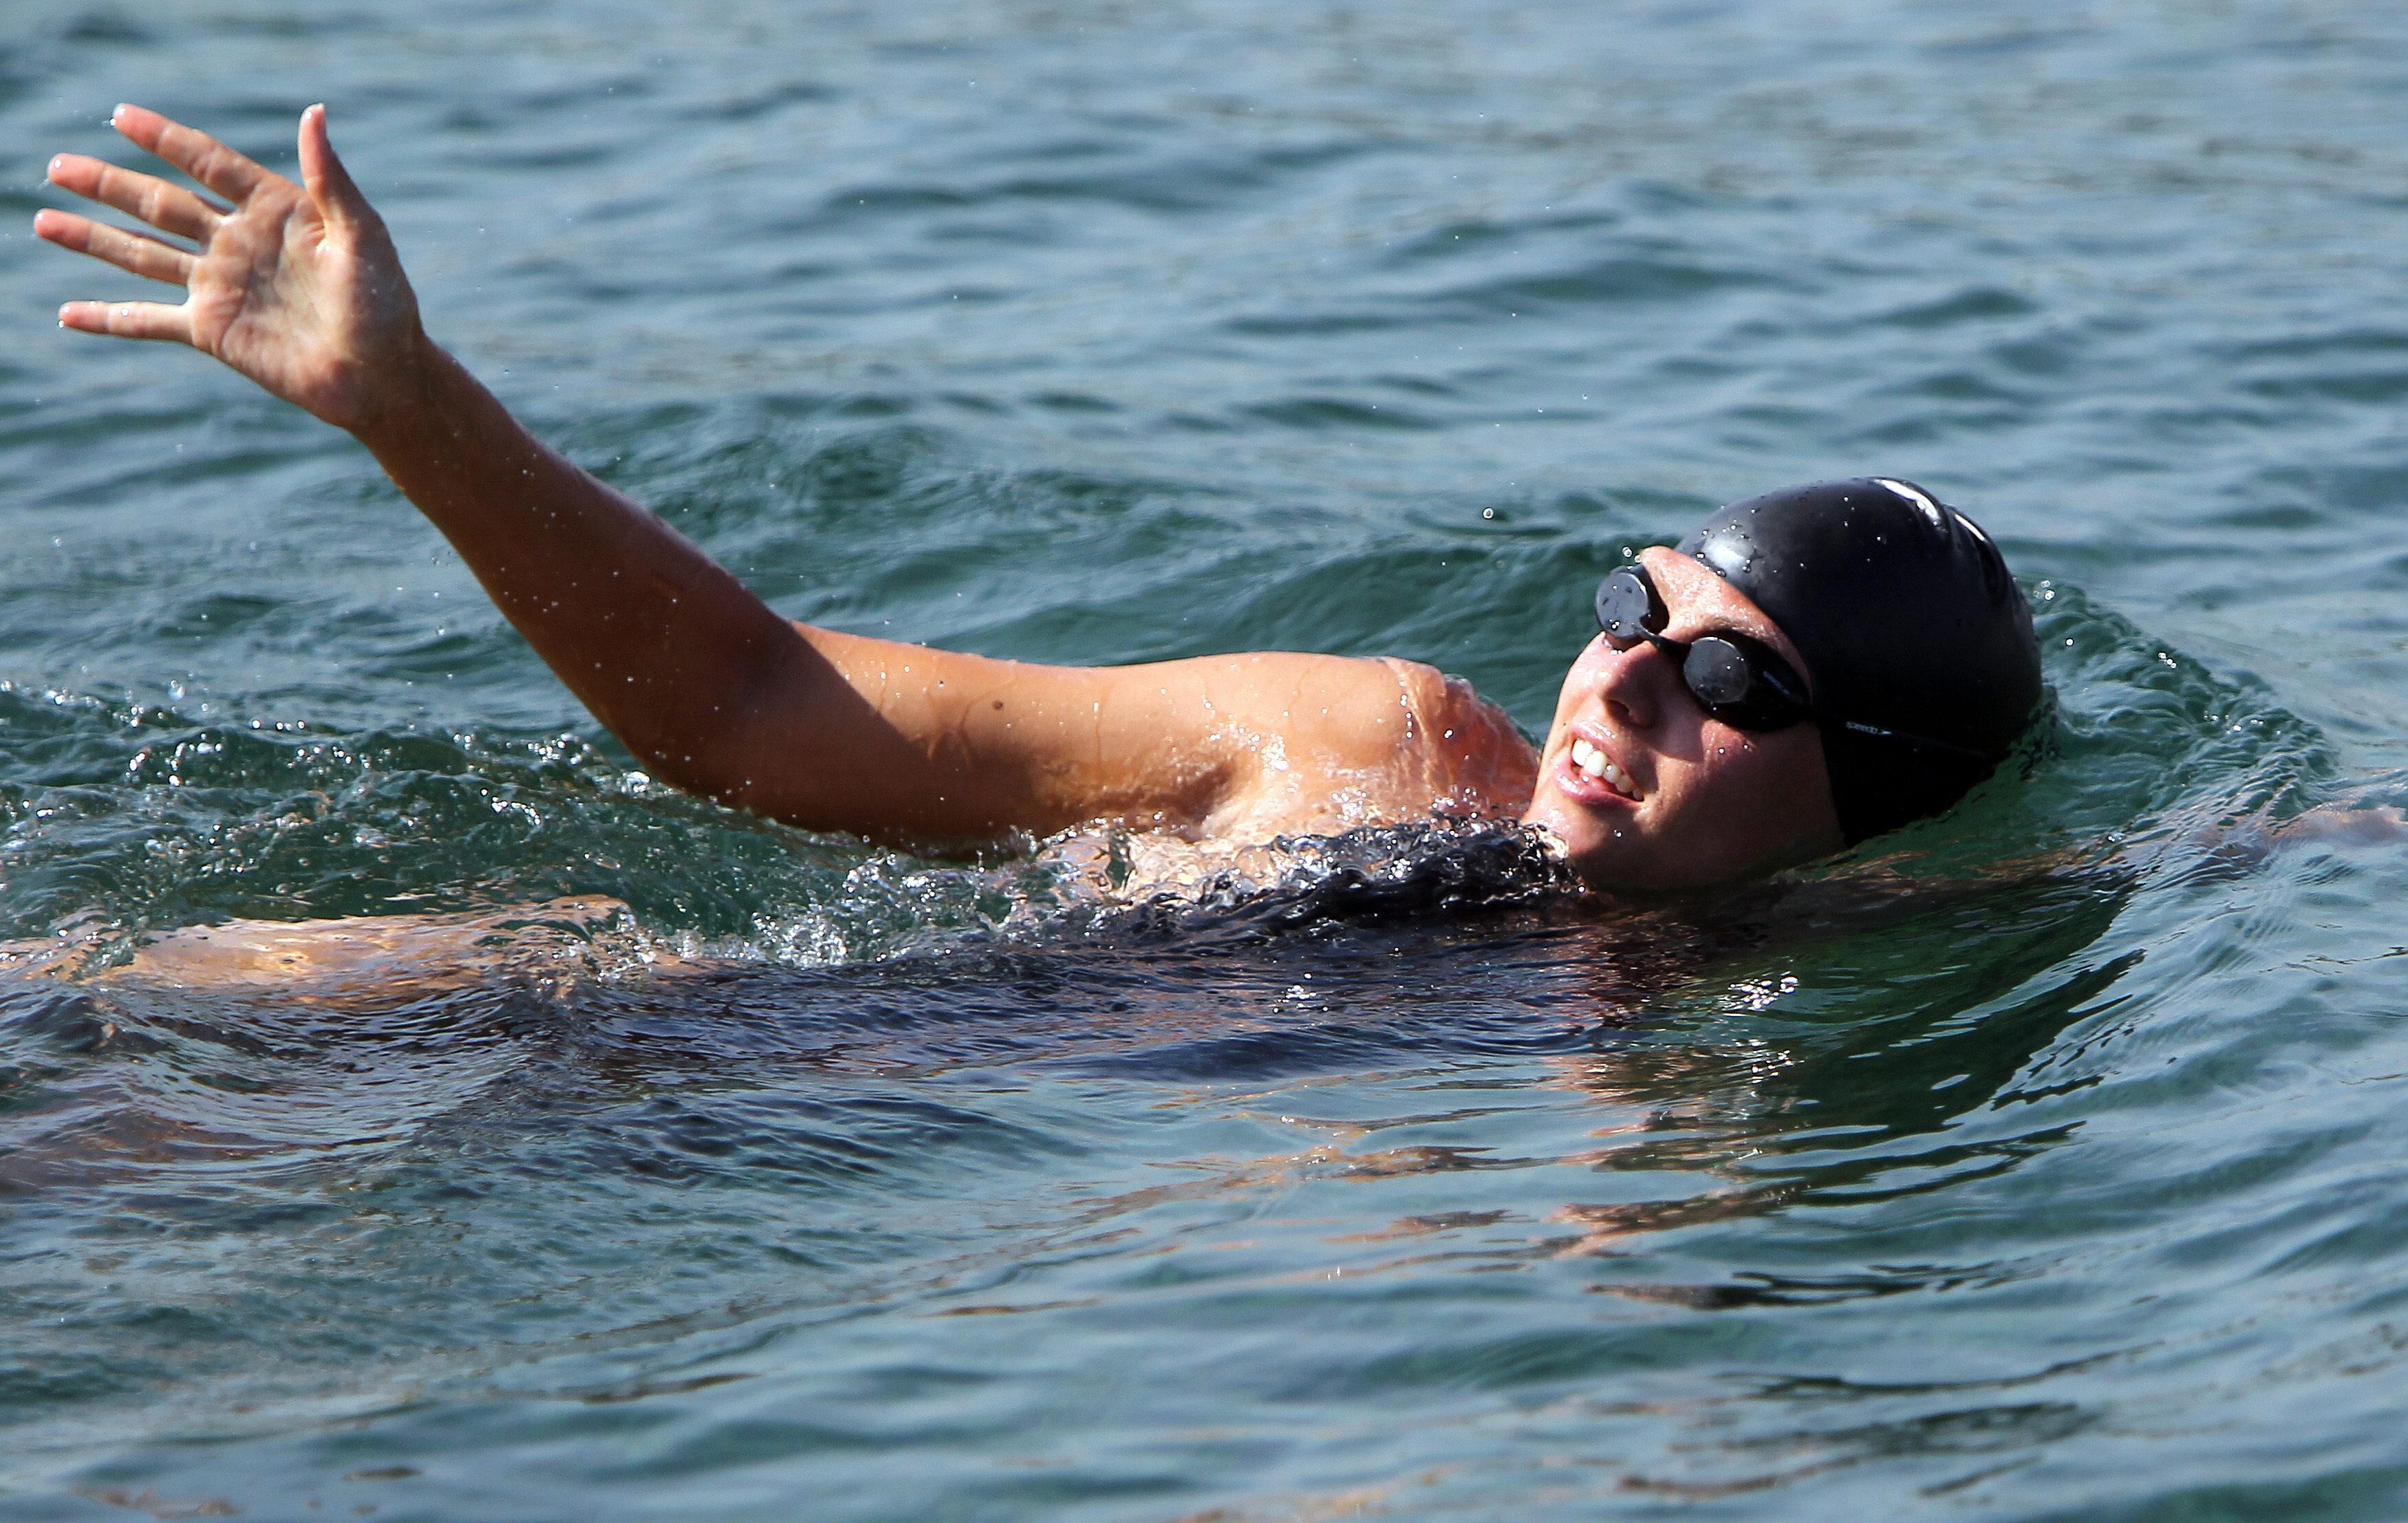 Nadadora australiana inicia cruce desde Cuba a EEUU sin jaula antitiburones